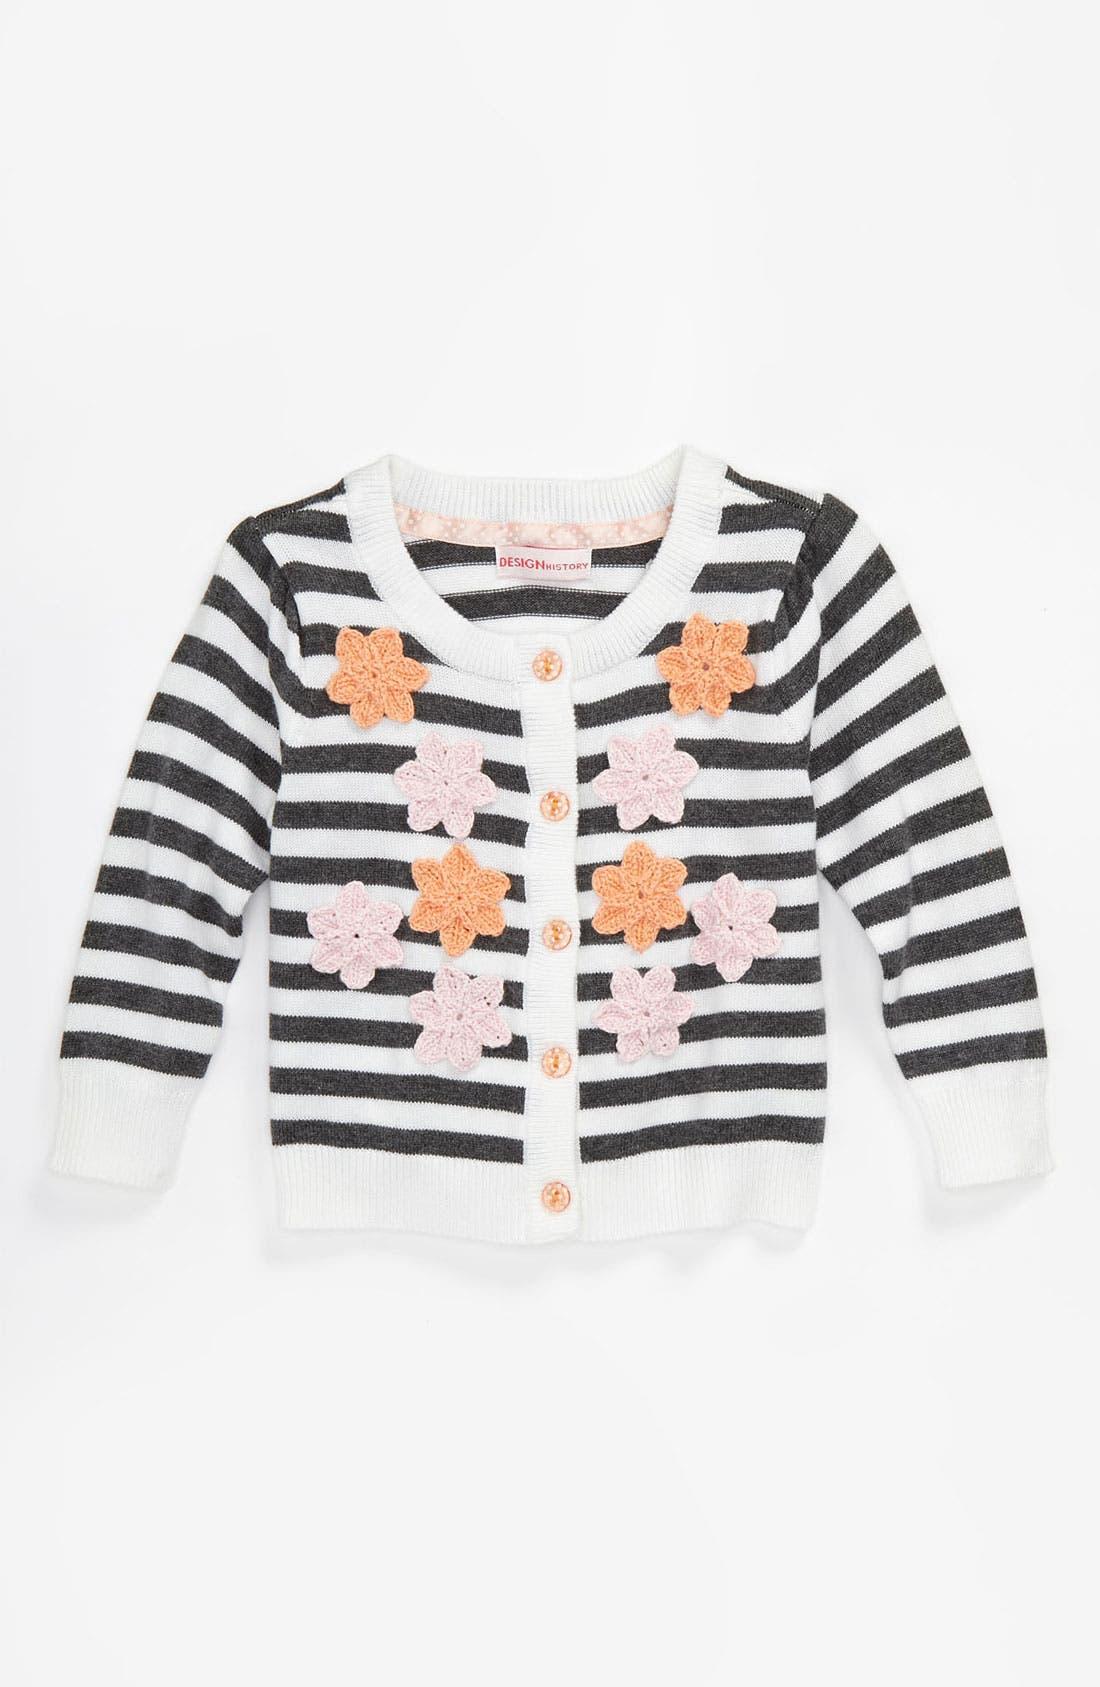 Alternate Image 1 Selected - Design History Stripe Cardigan (Toddler)